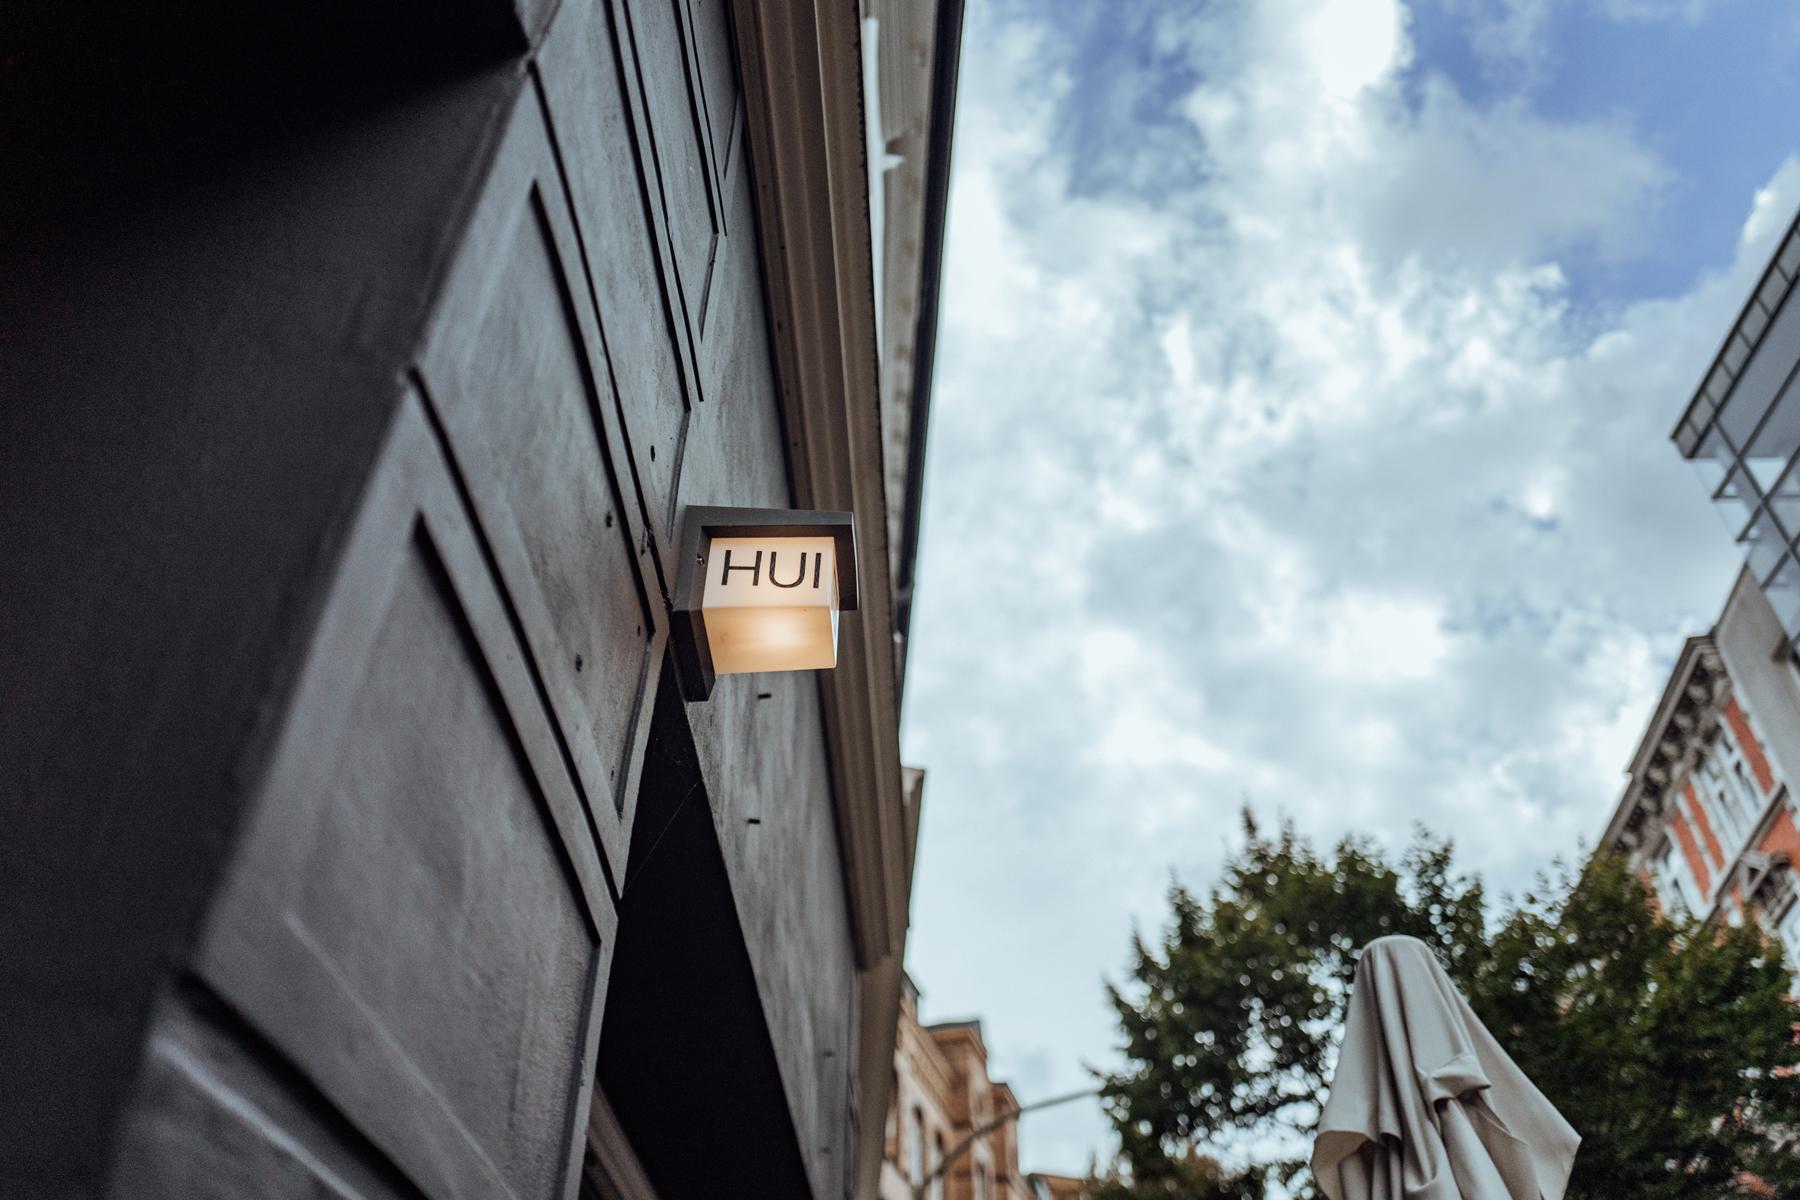 Geheimtipp Hamburg Essen & Trinken Restaurant St Pauli Hui Cookshop Lilli Sprung 51